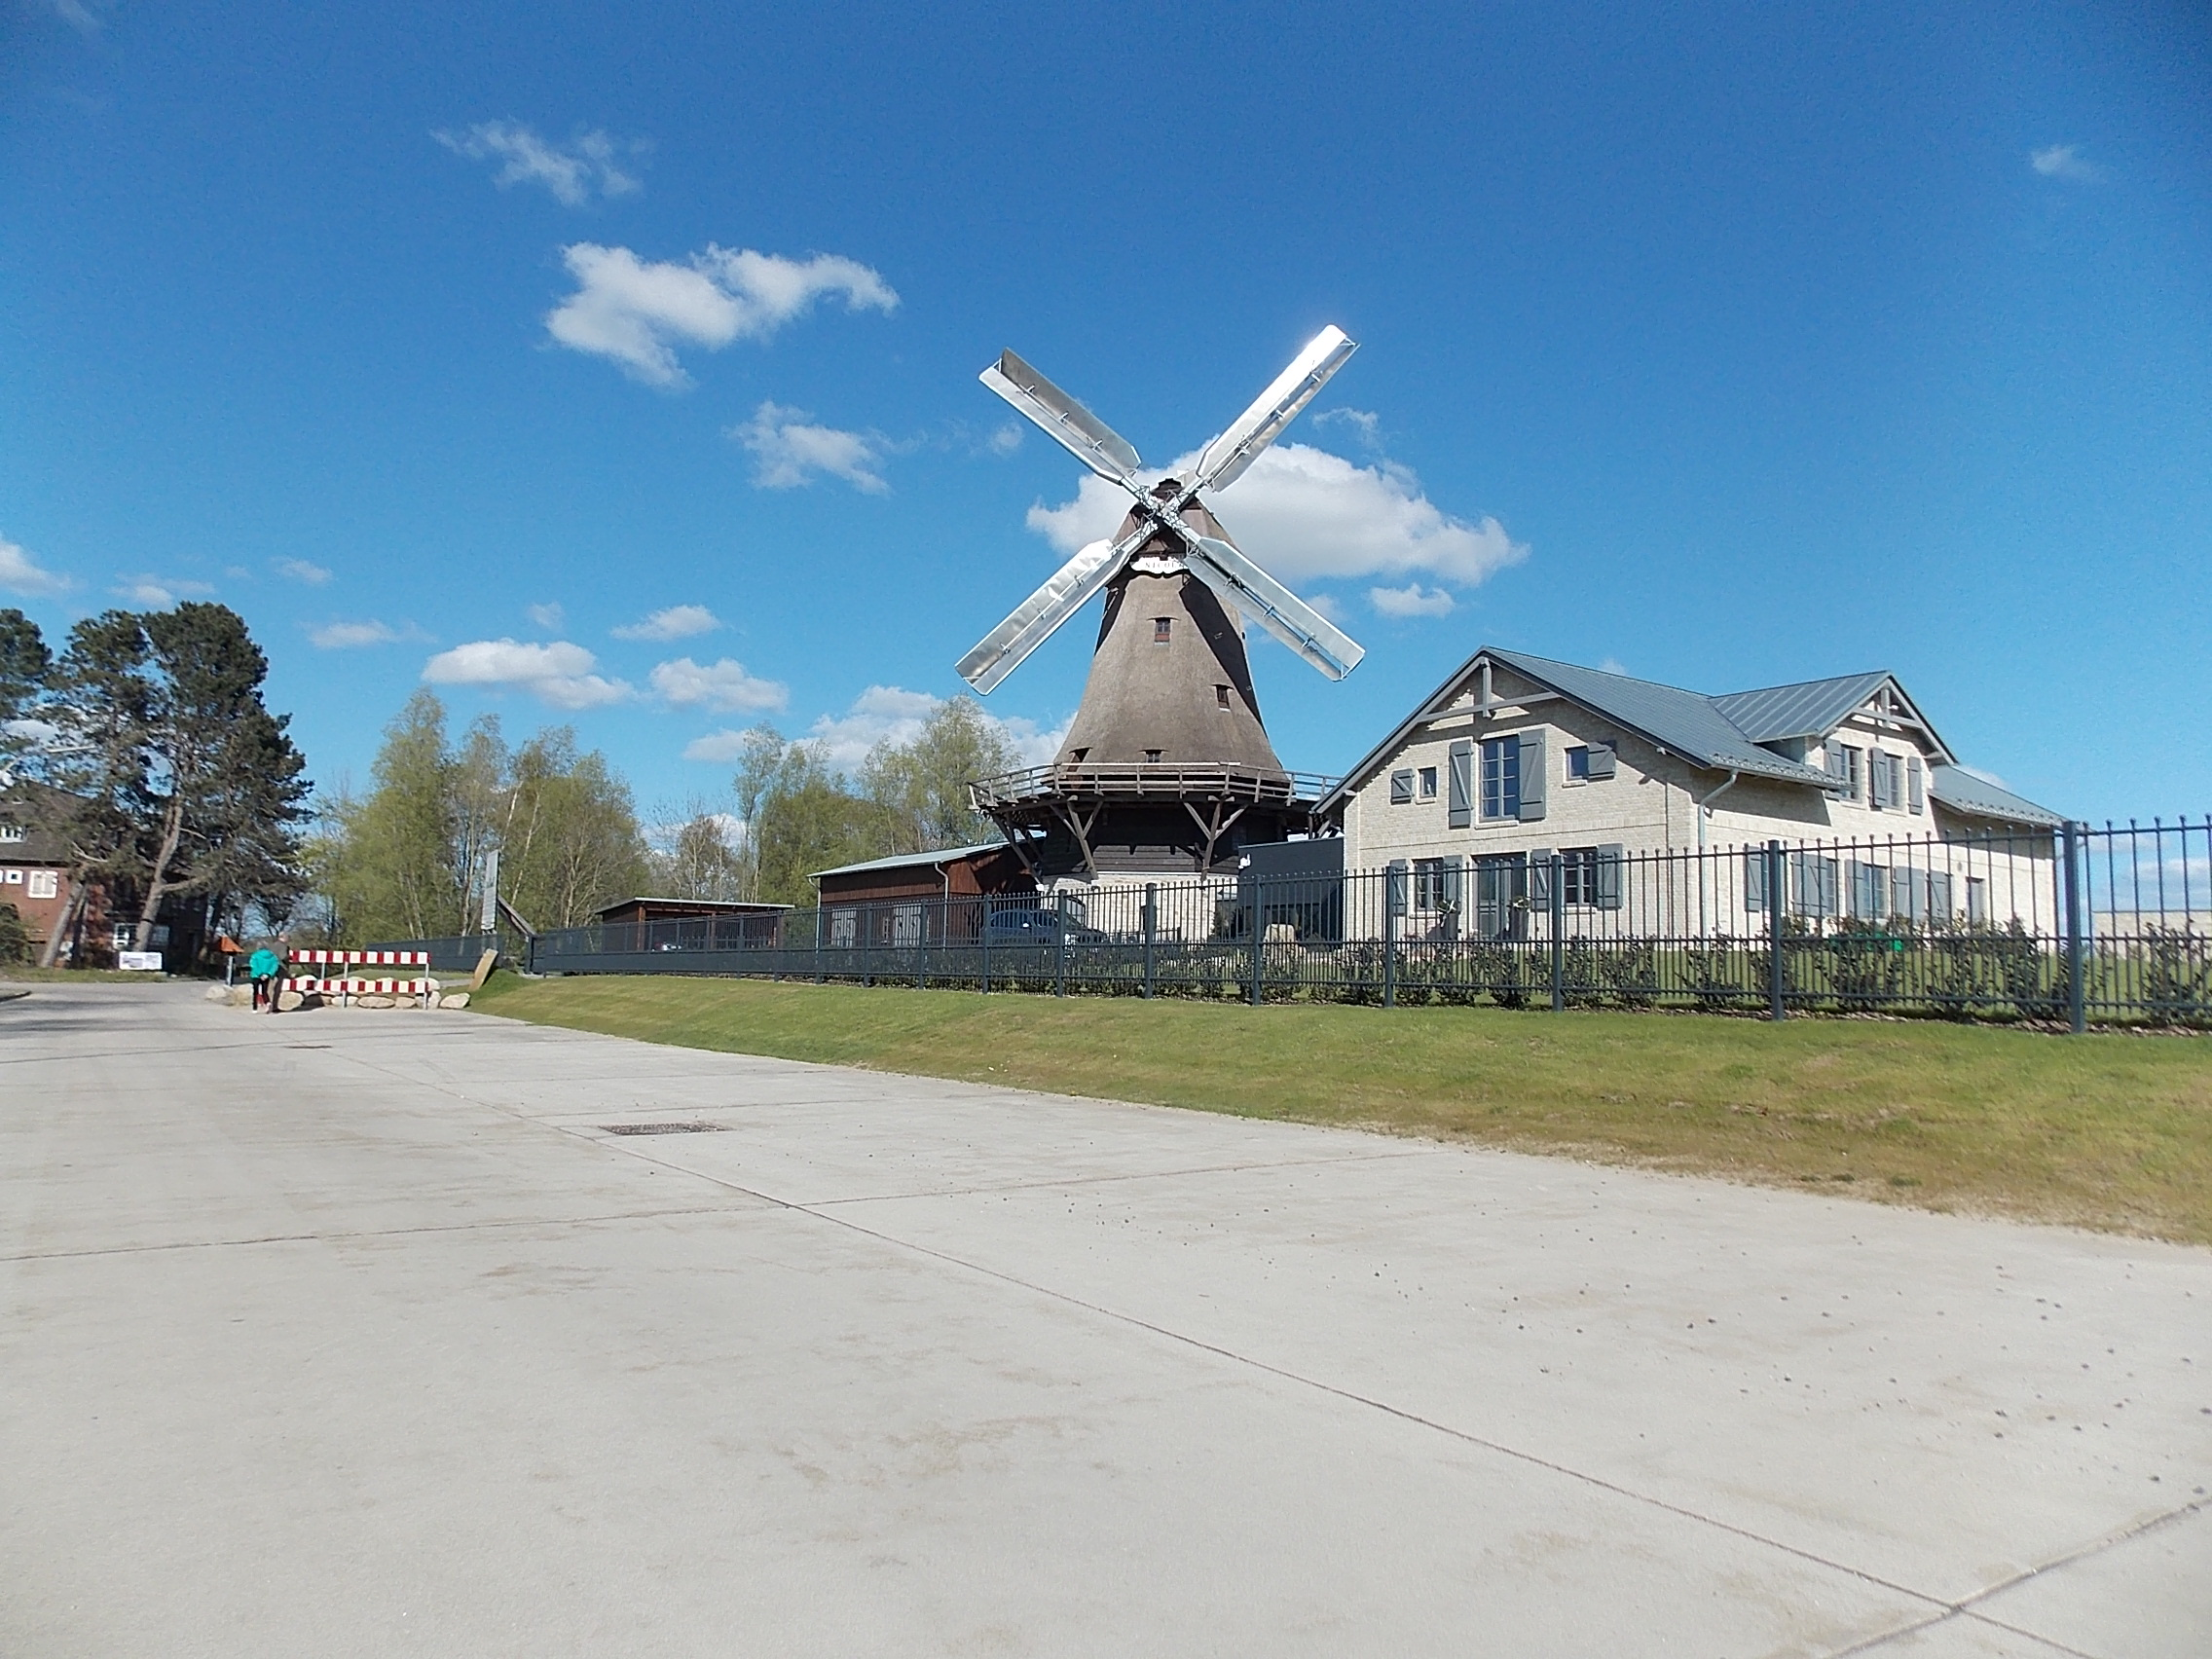 Schleswig Mühle Nicola